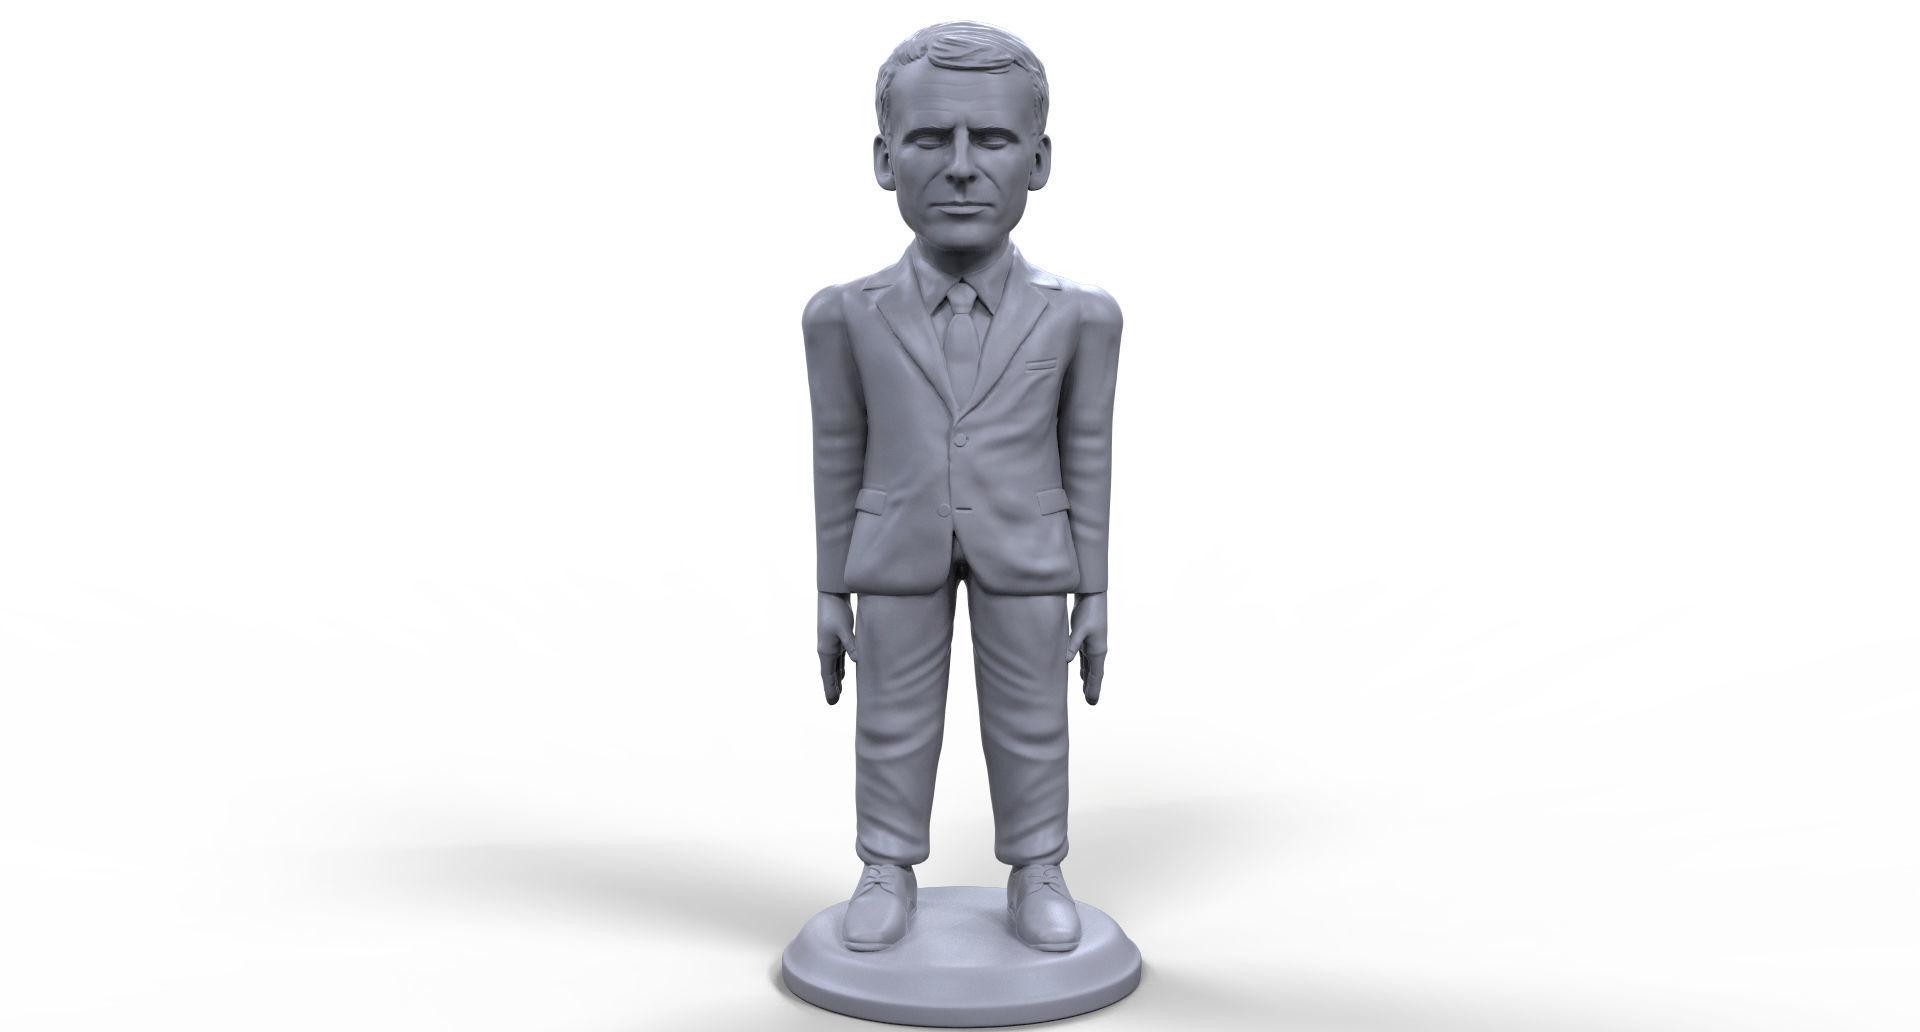 Emmanuel Macron stylized high quality 3D printable miniature